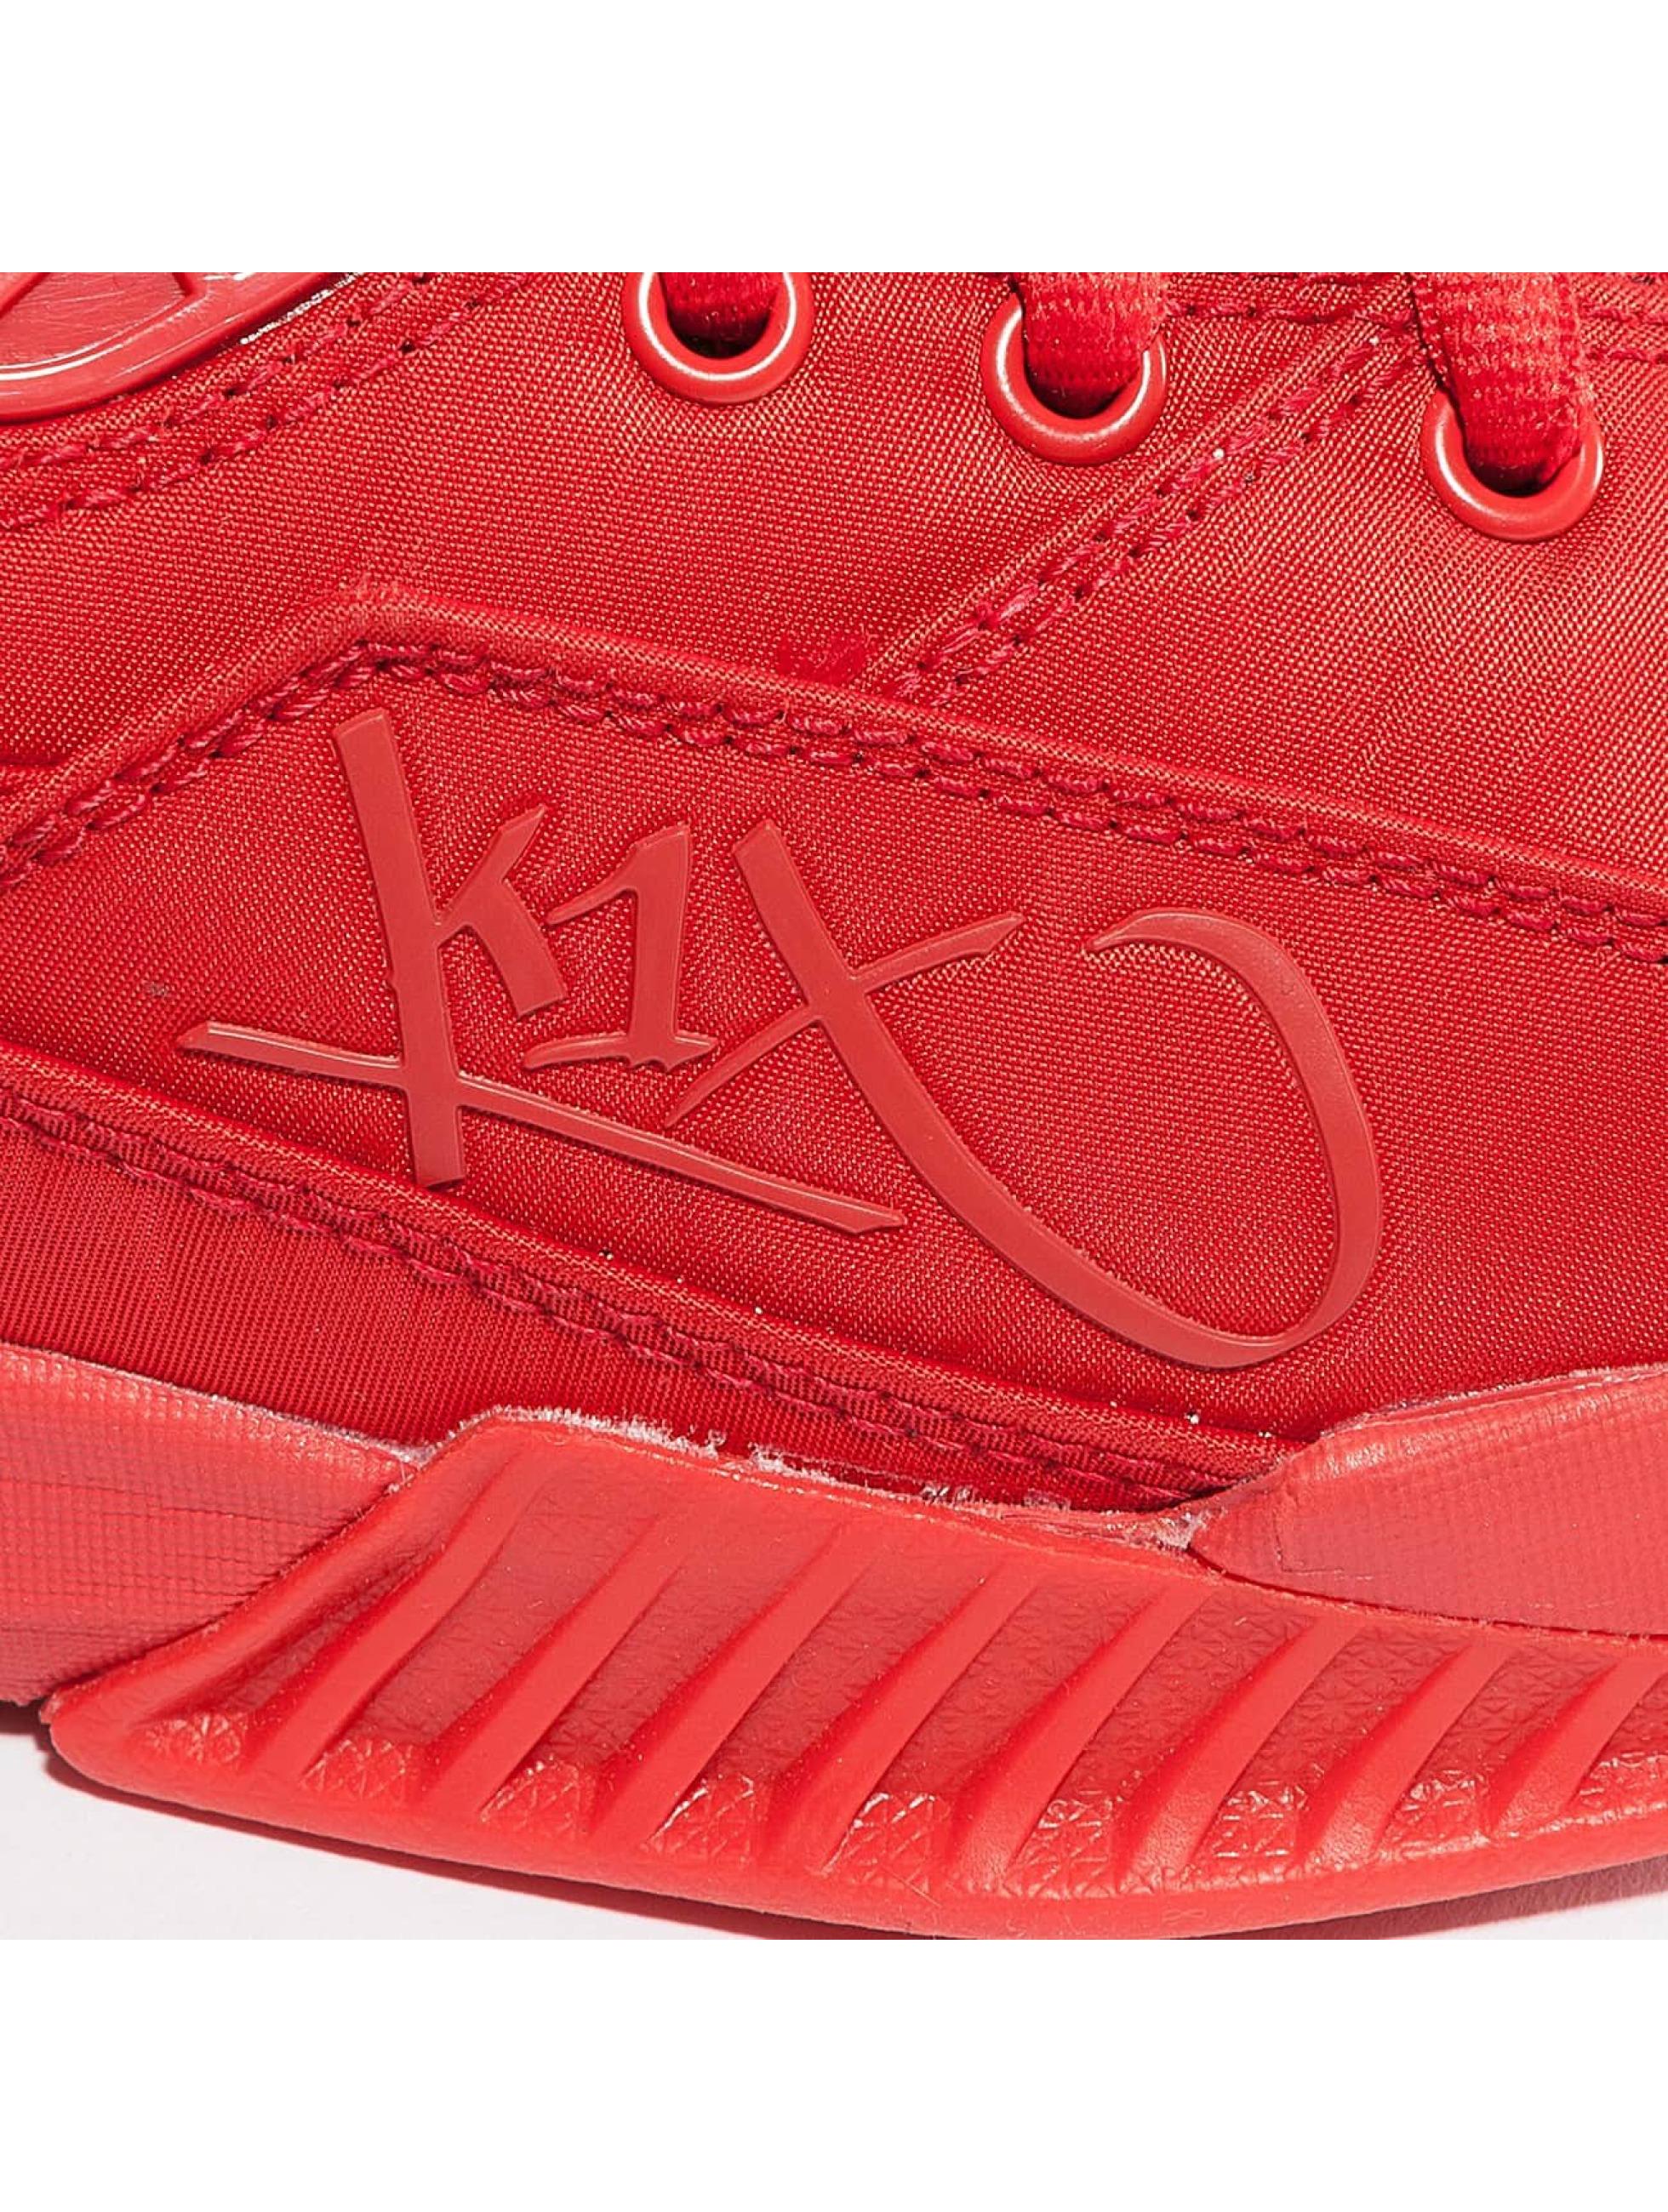 K1X Tennarit Anti Gravity punainen